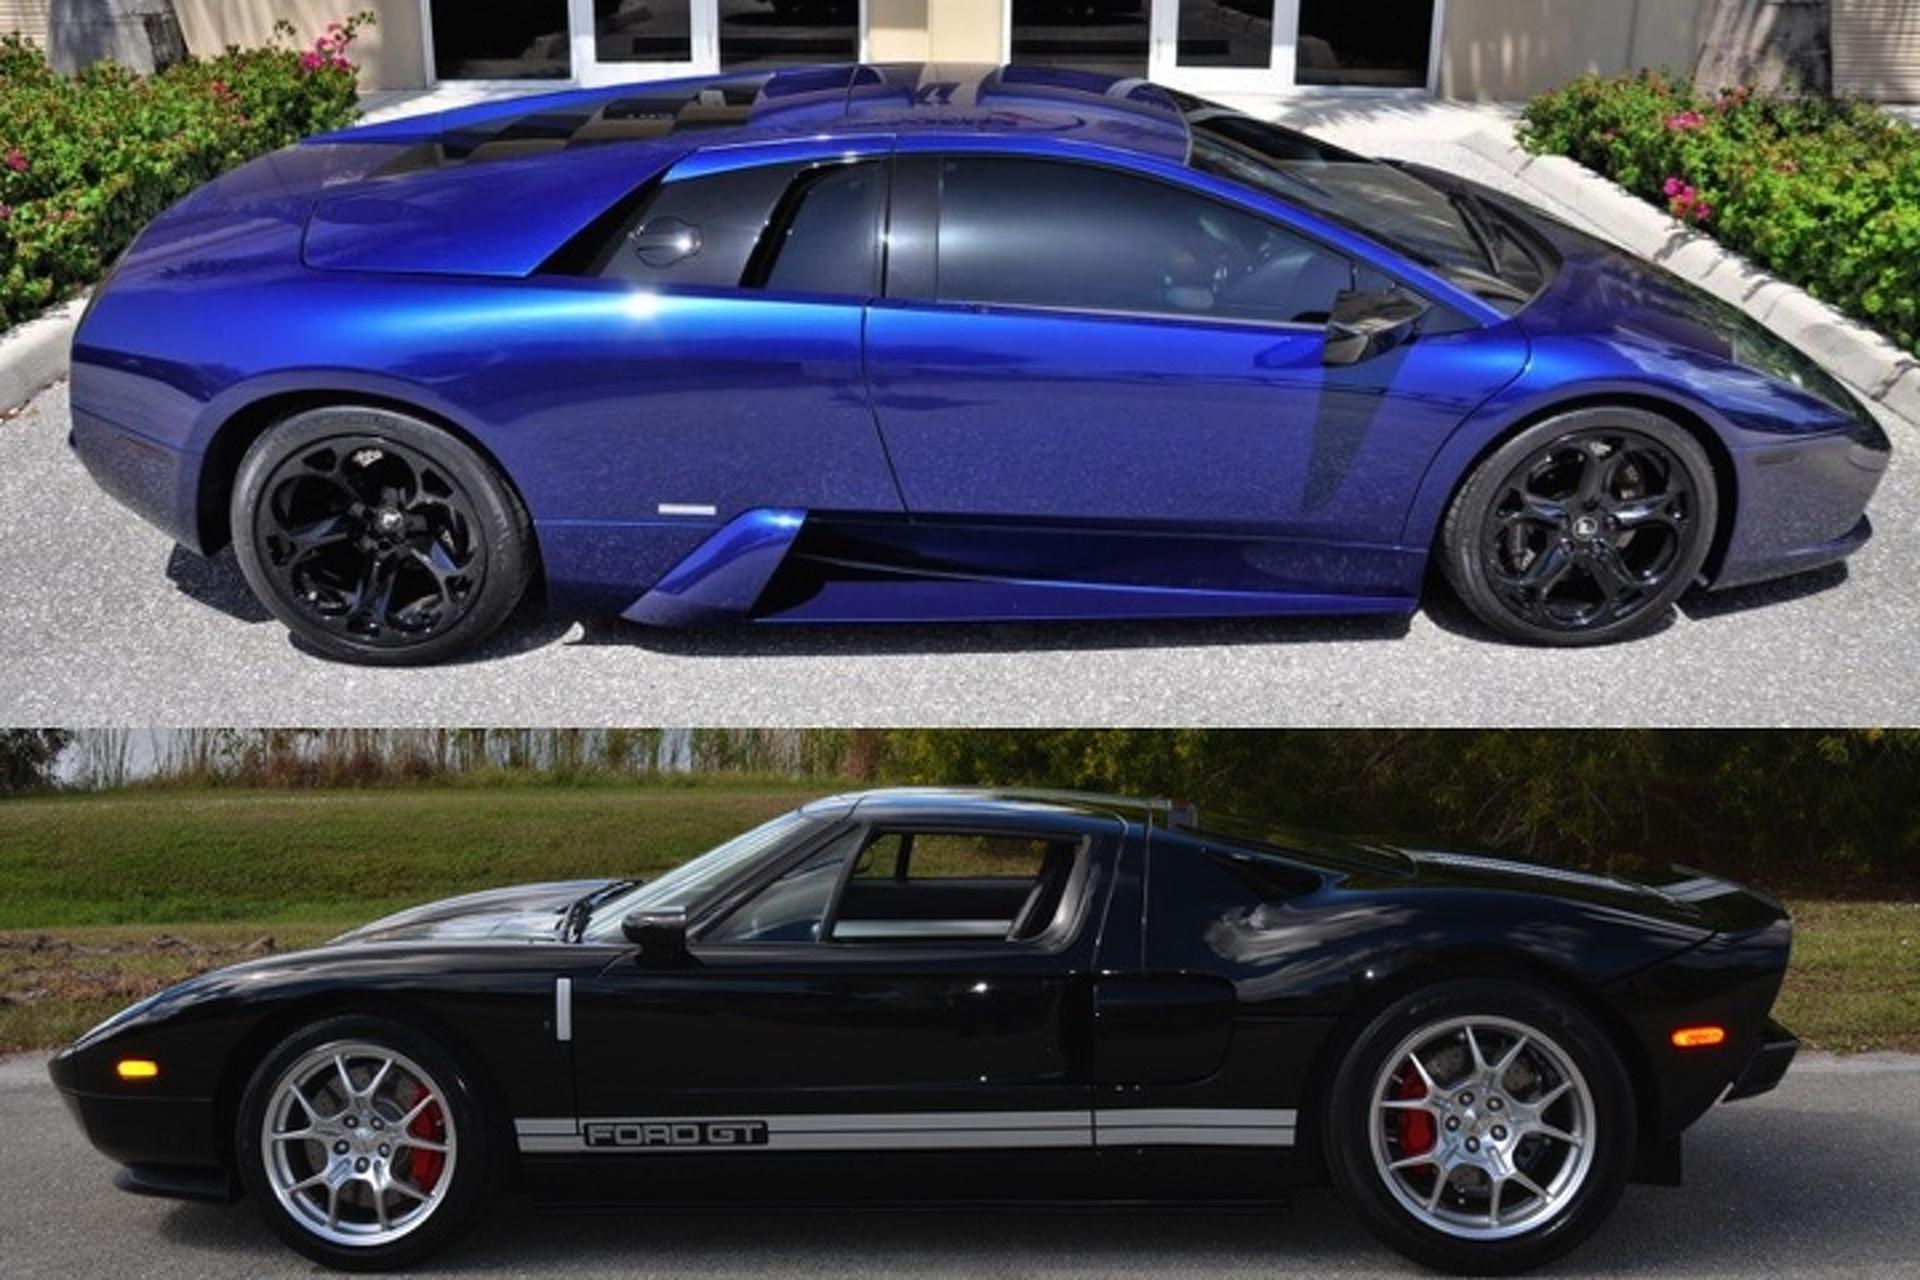 Pristine  Ford Gt Or Hp Lamborghini Murcielago Which Would You Buy